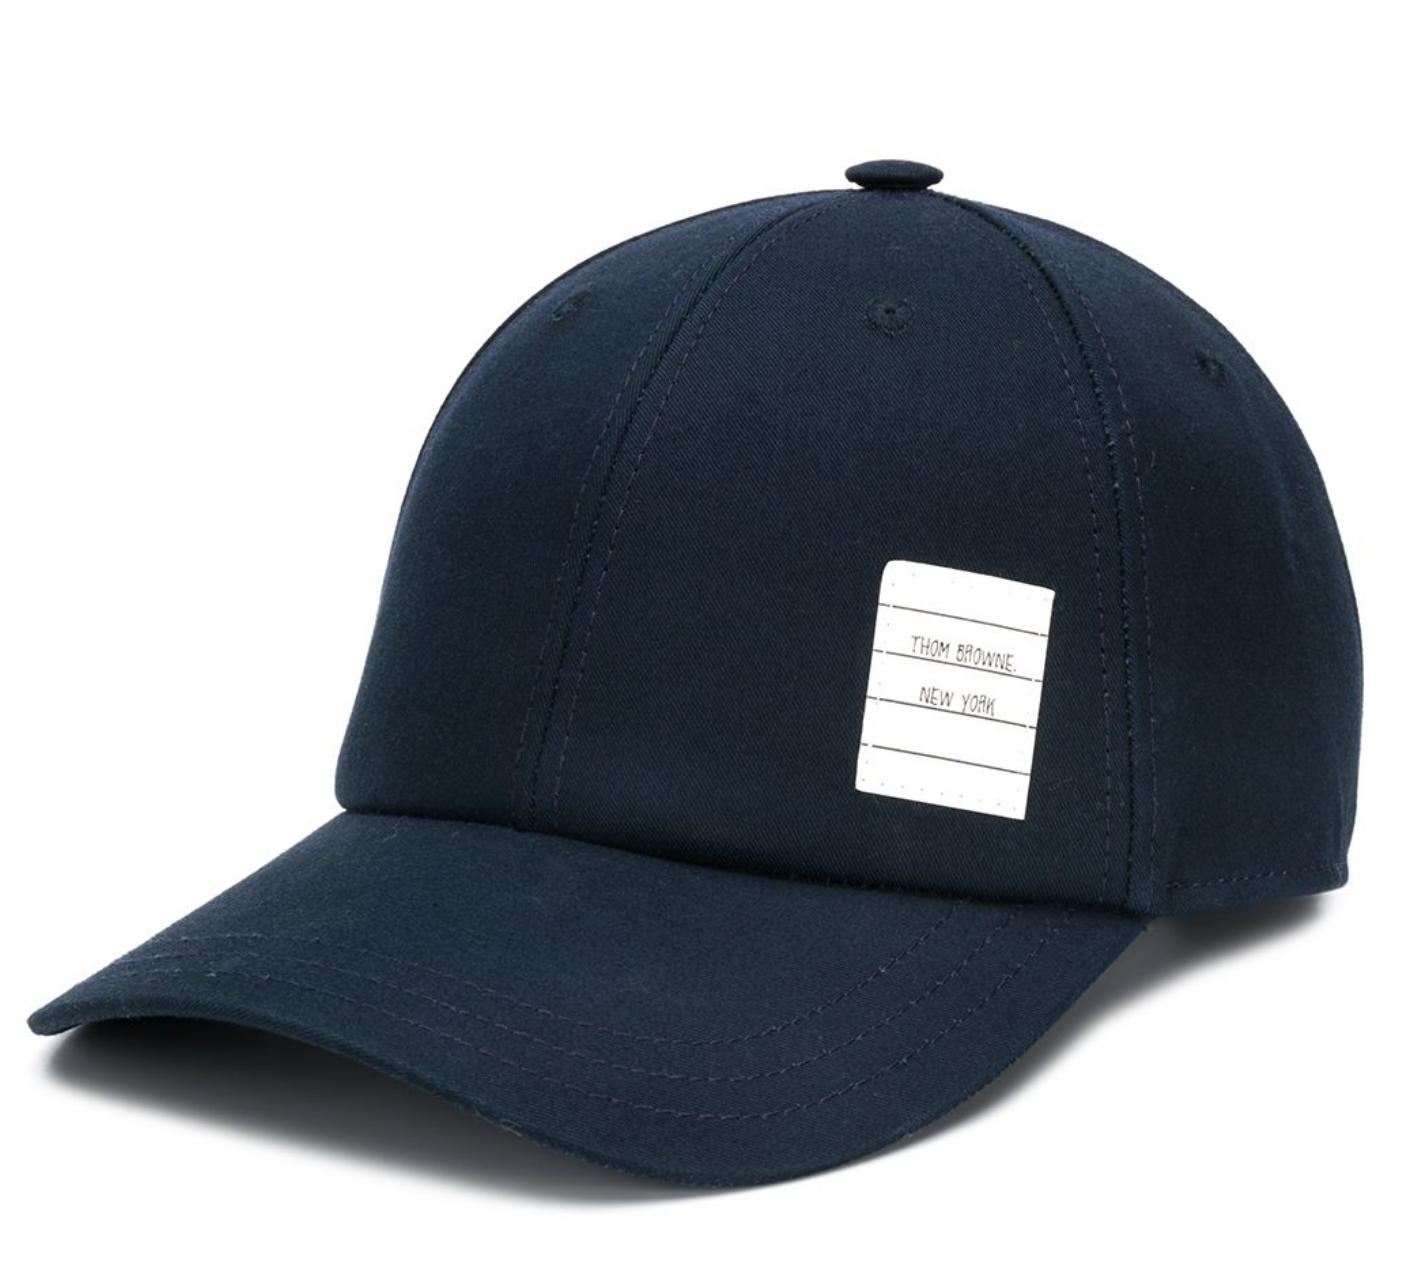 Gorra de Thom Browne